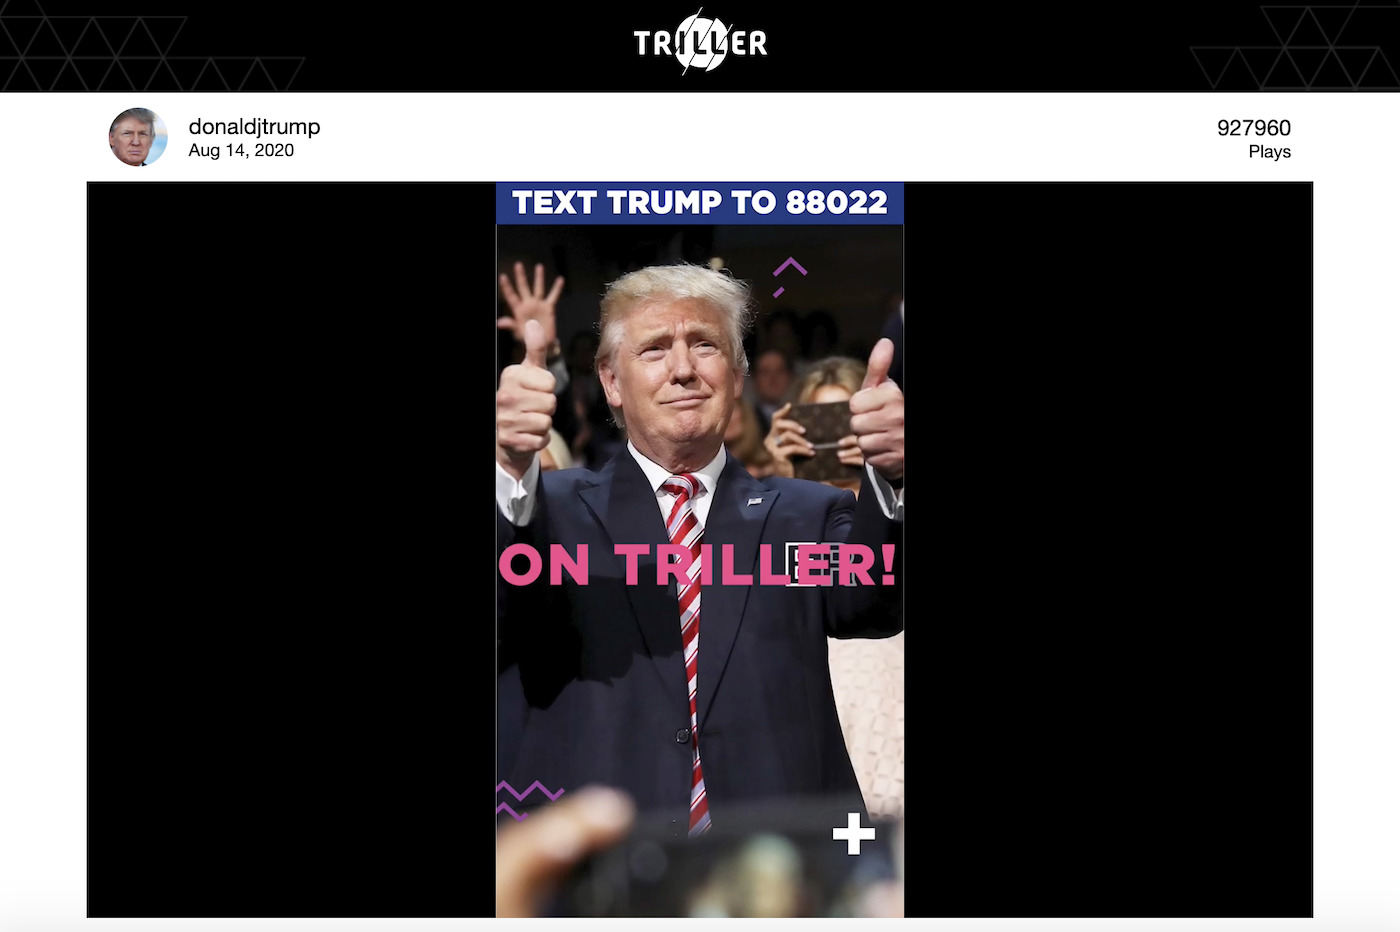 Donald Trump Triller